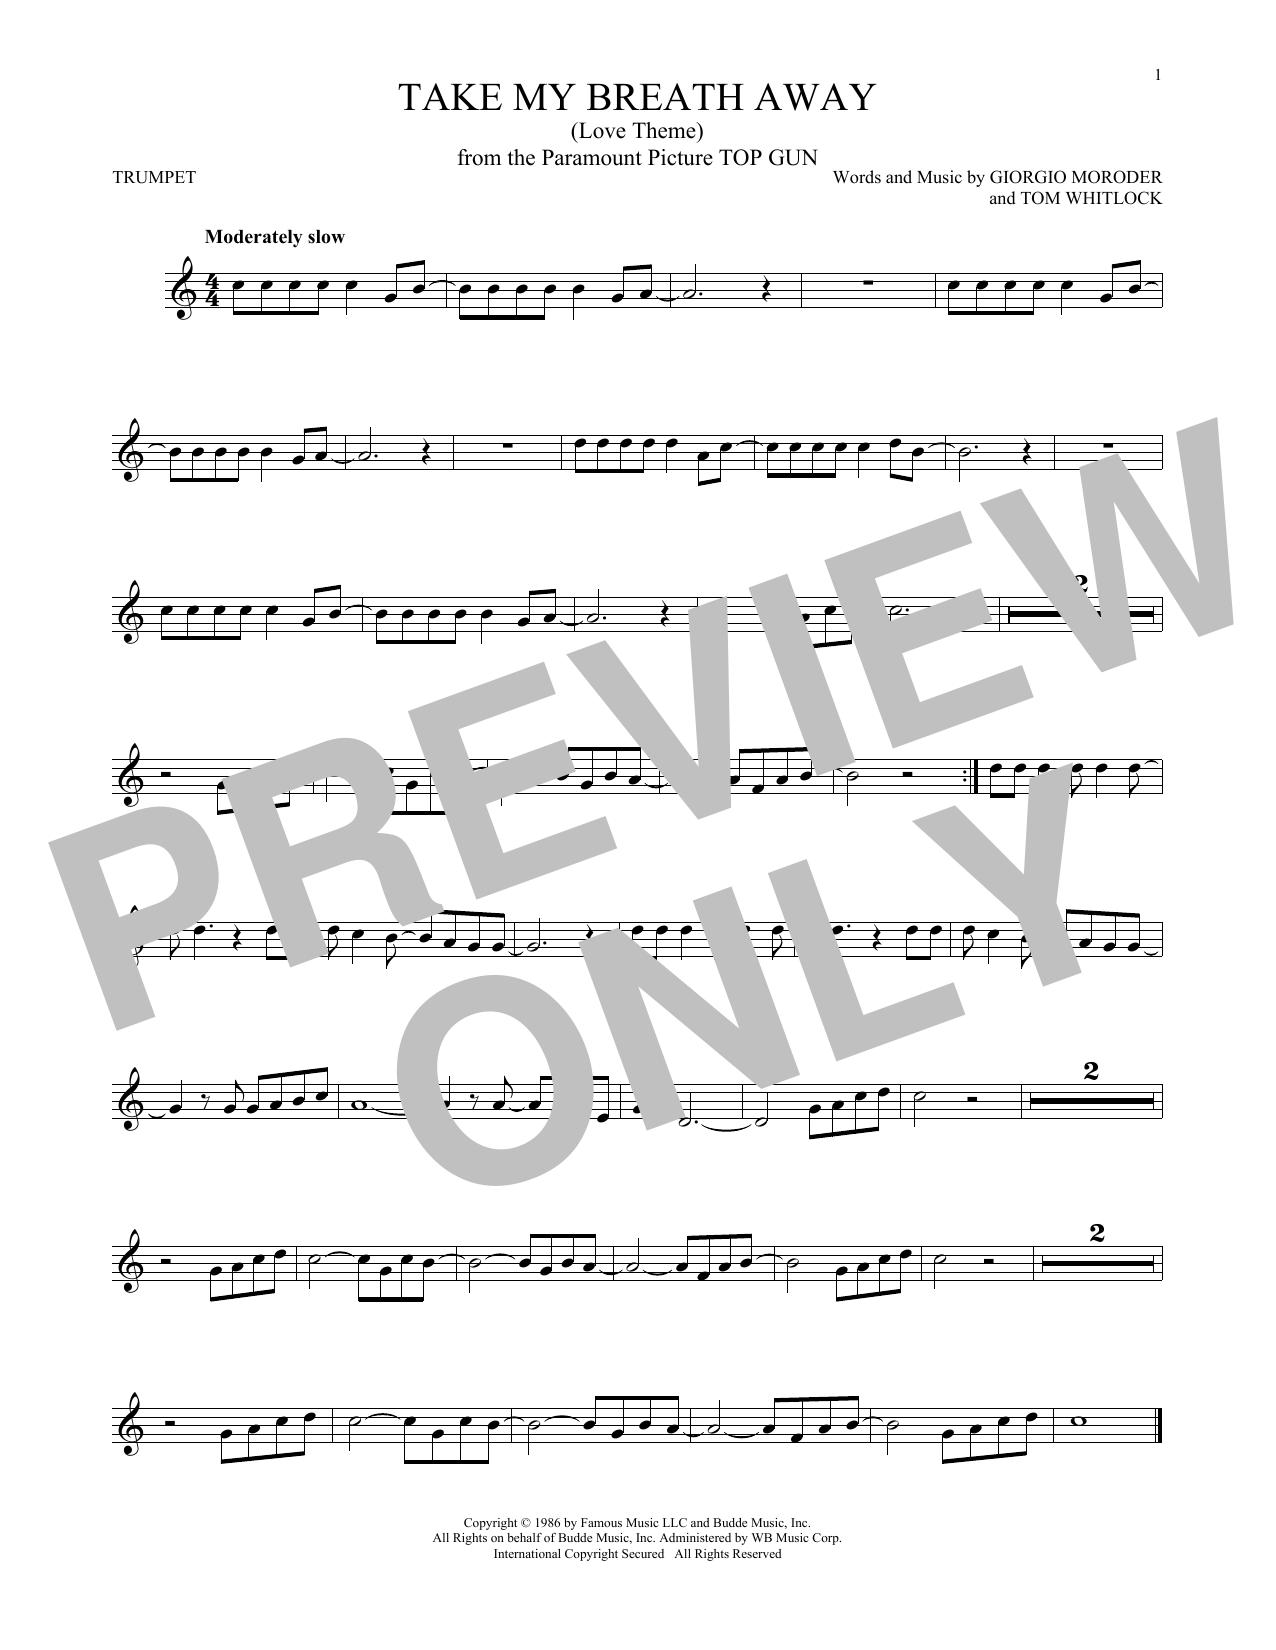 Take My Breath Away (Love Theme) Sheet Music